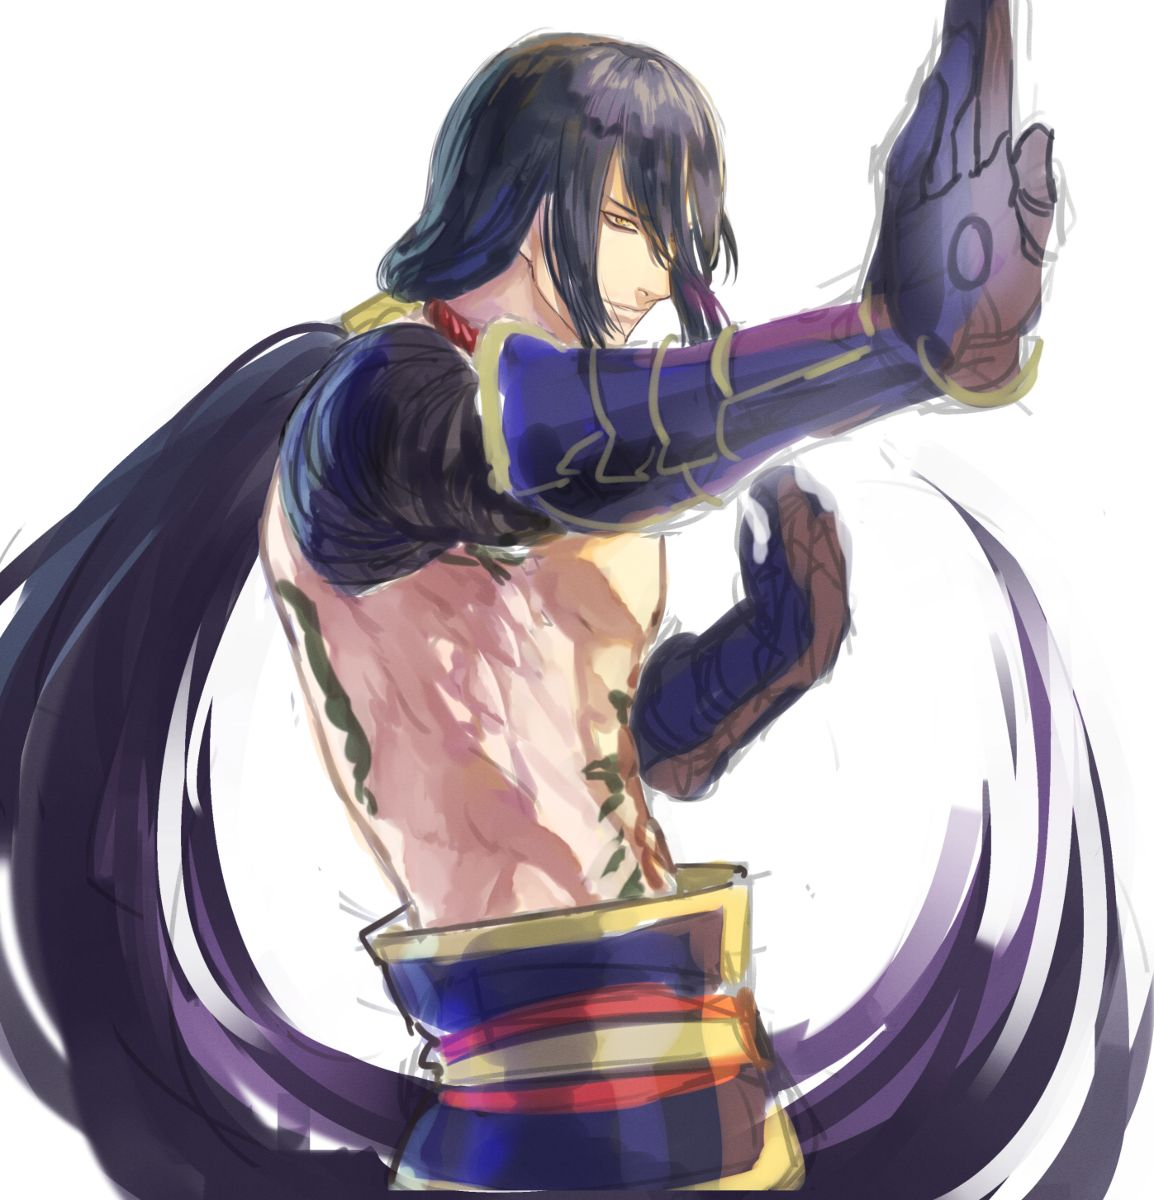 Yan Qing【Fate/Grand Order】 Fate characters